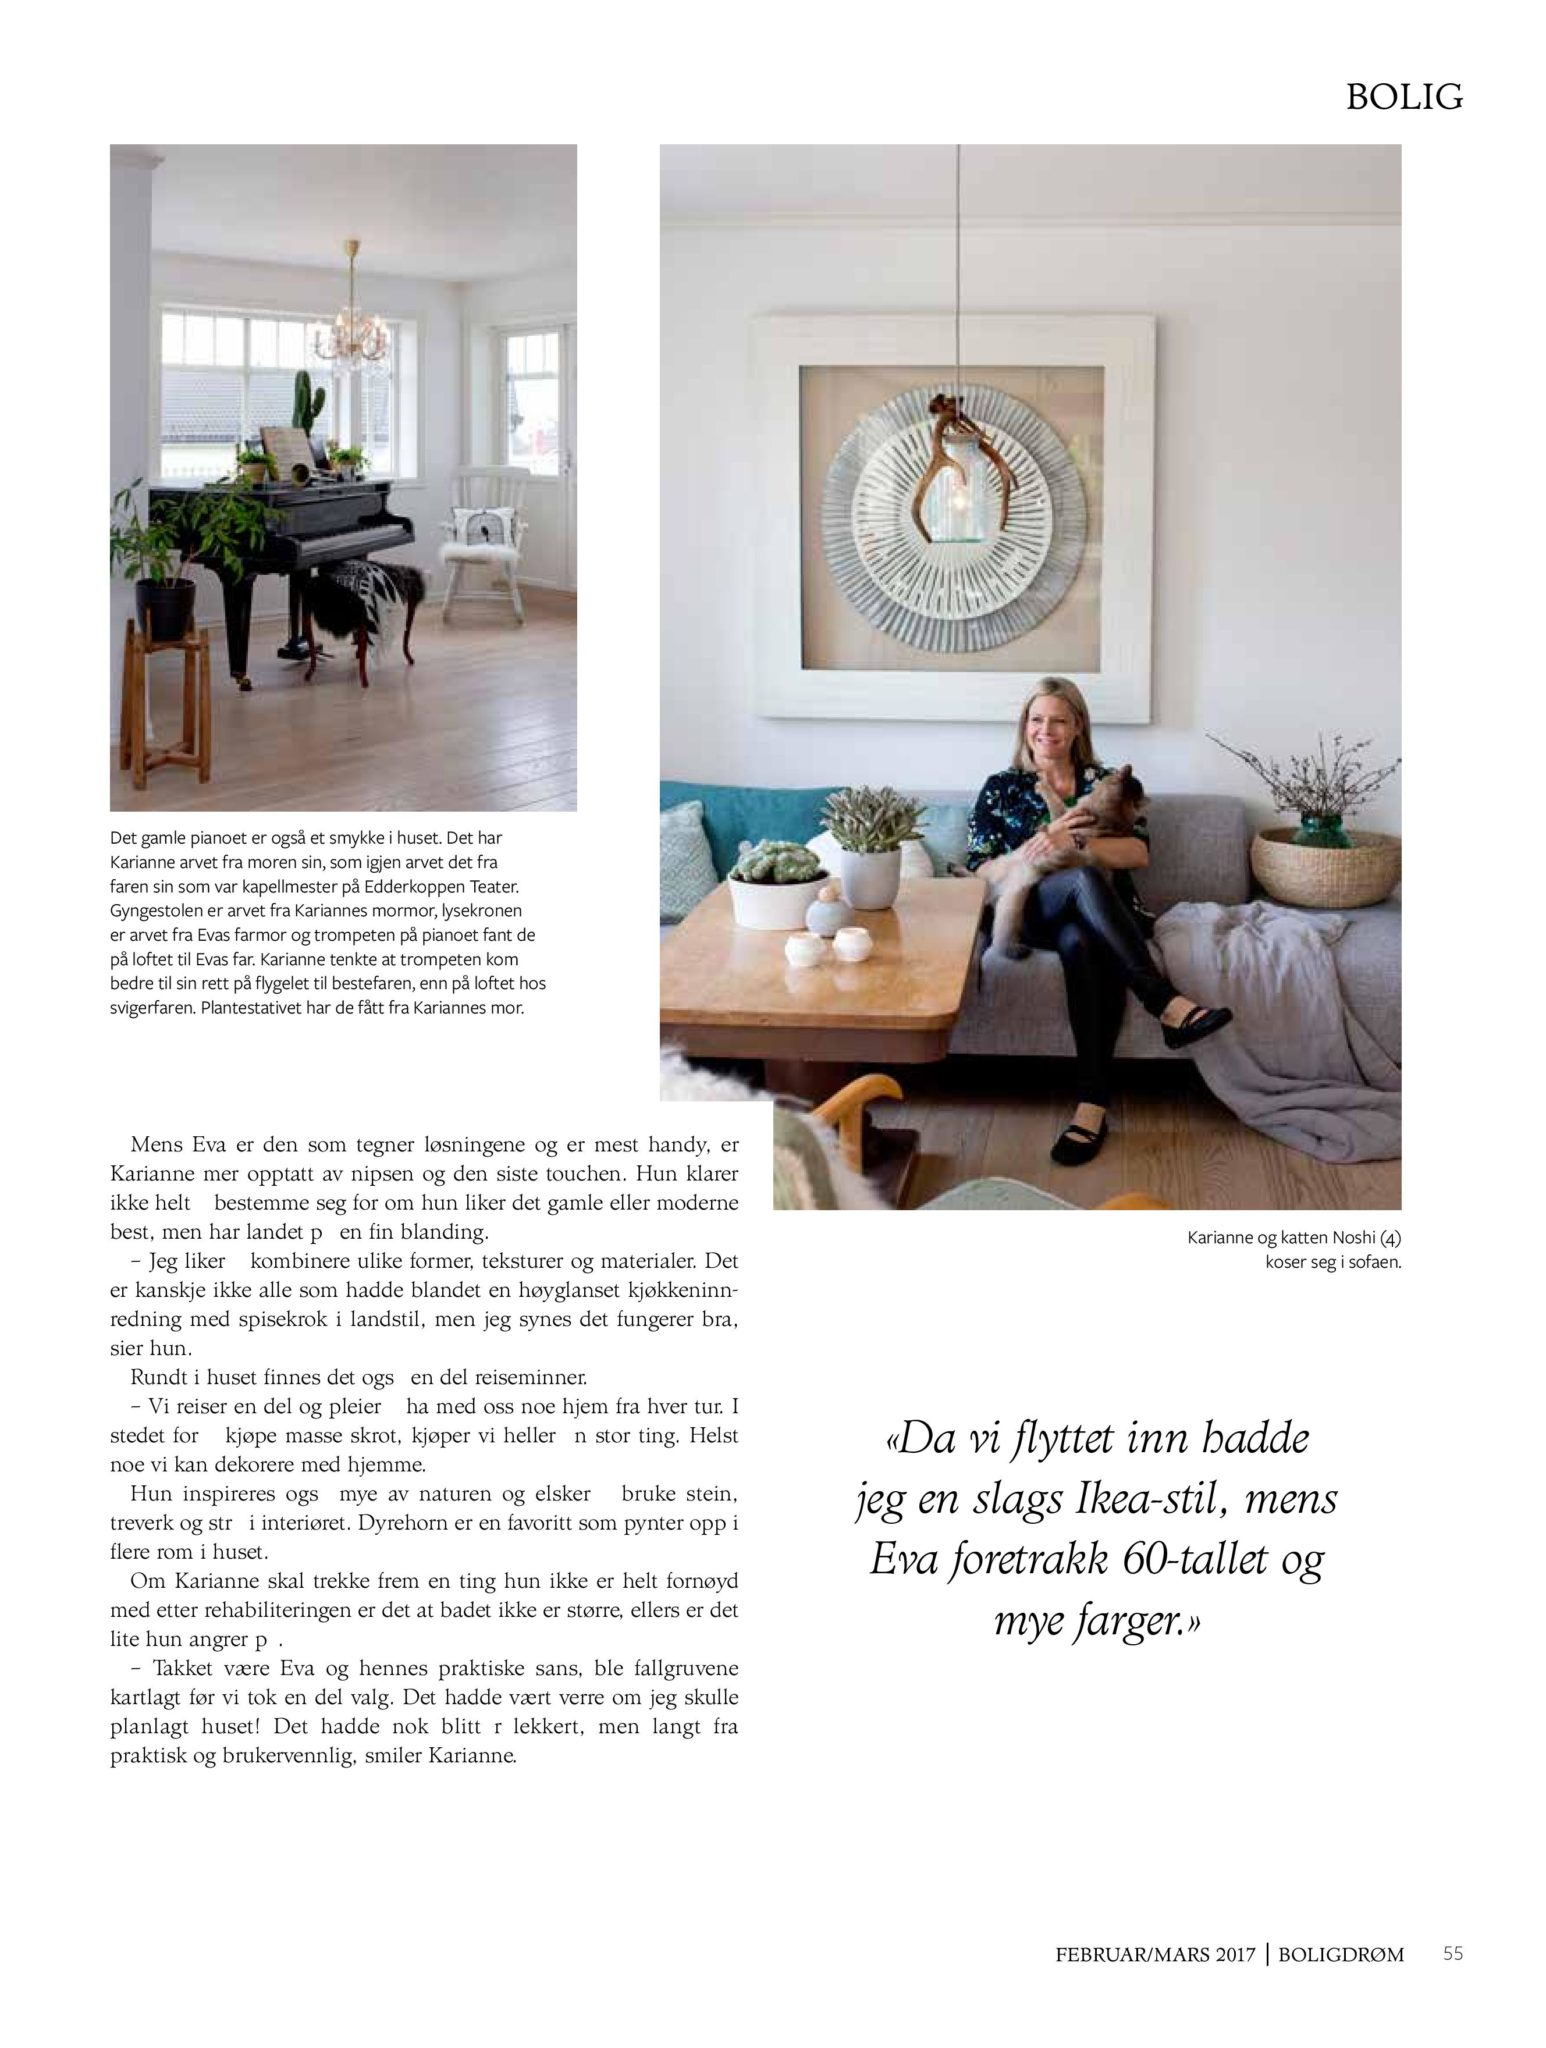 boligreportasje Karianne Gustavsen BoligDrøm nr. 2/2017 side 8